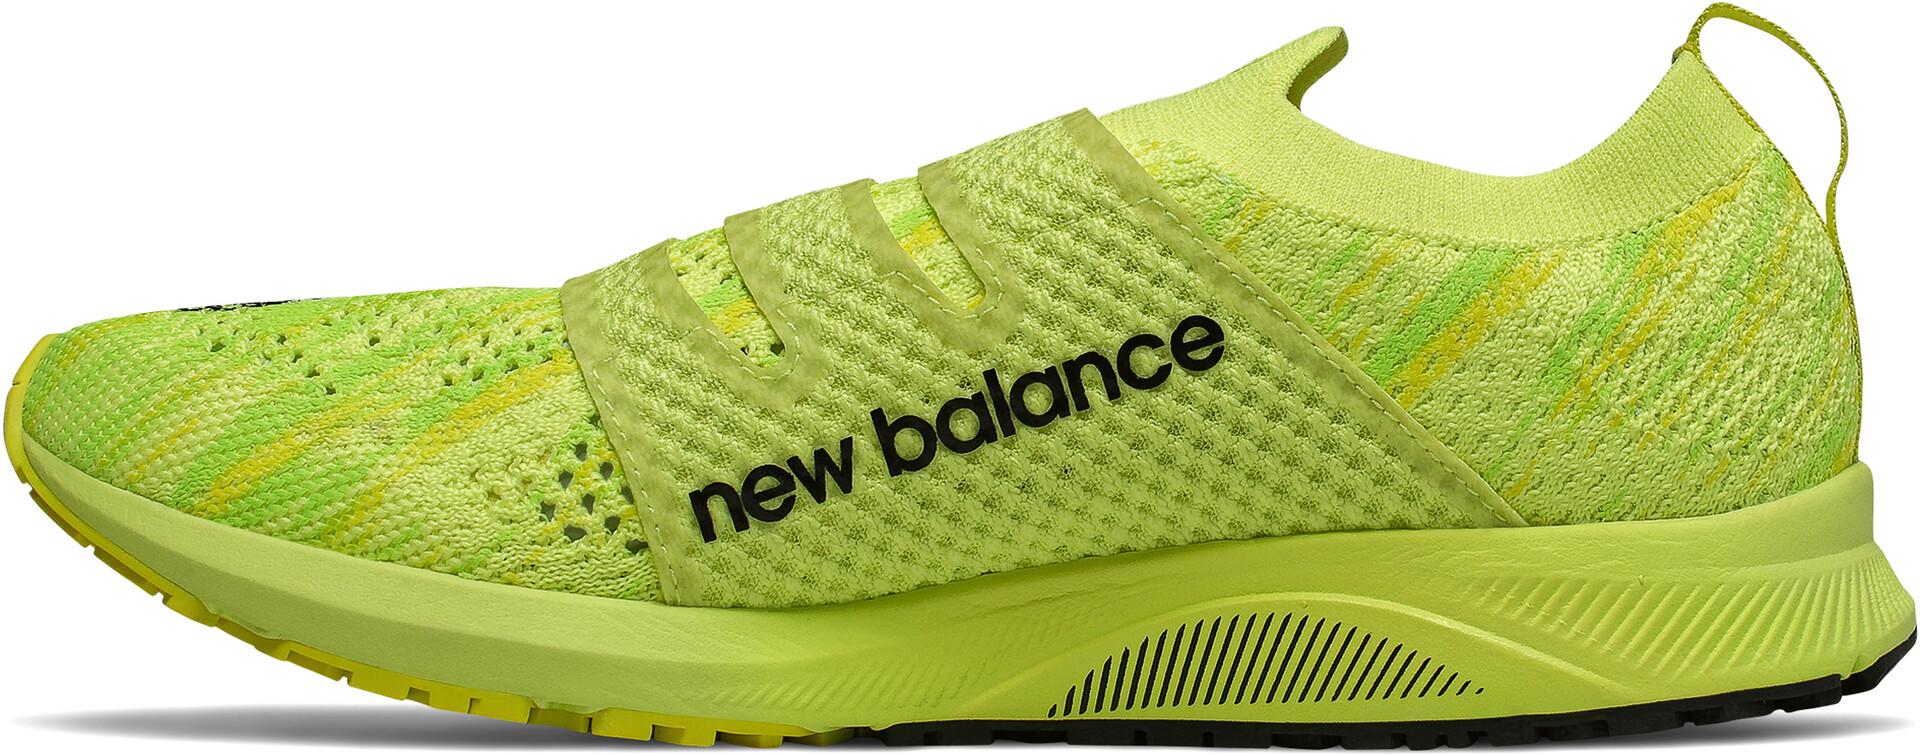 new balance 1500 tb2